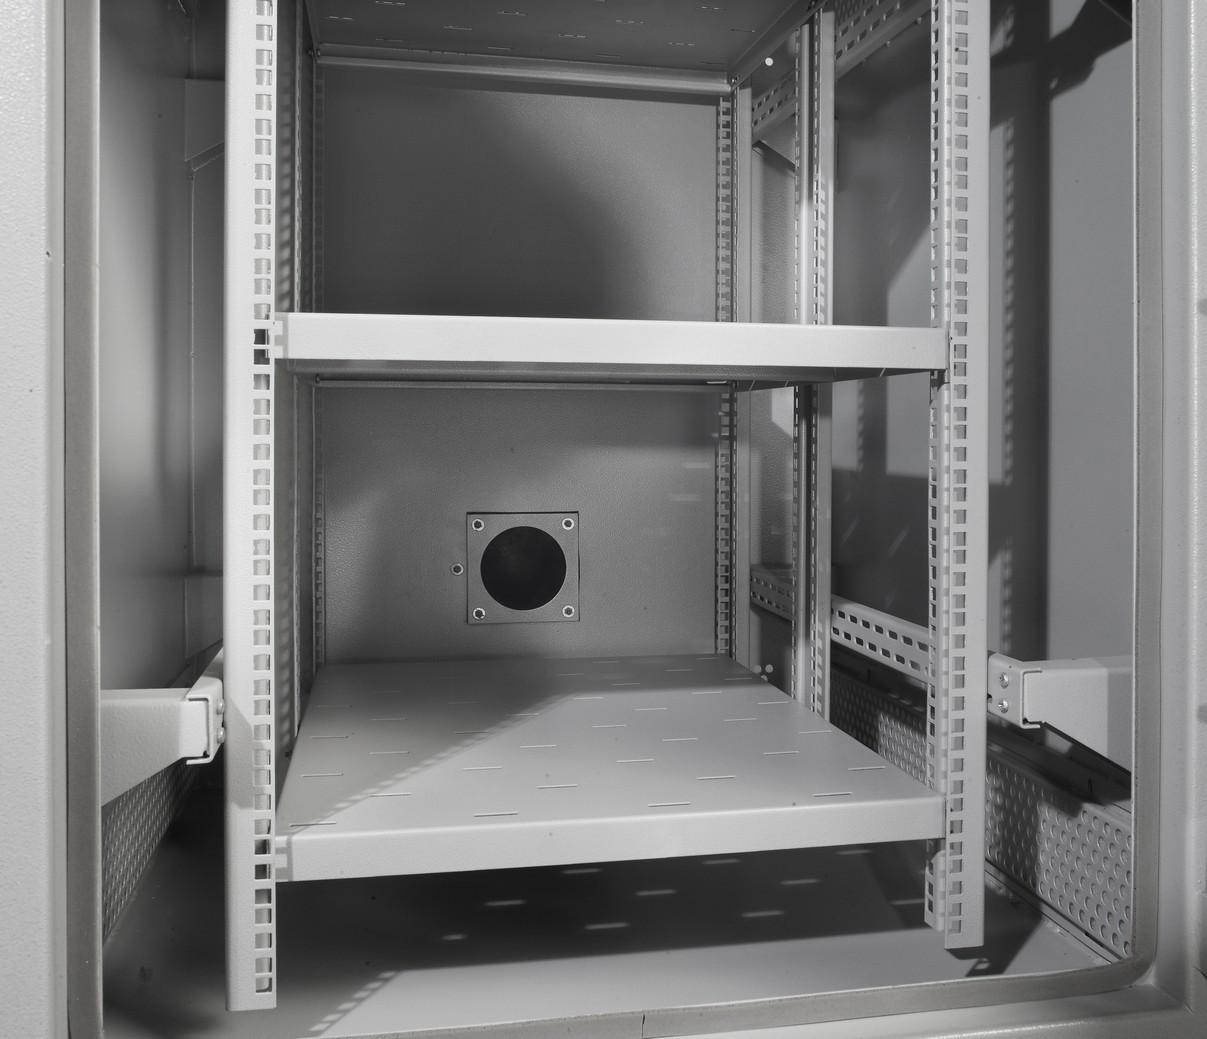 armoire forte hartmann serveurs informatiques serveur. Black Bedroom Furniture Sets. Home Design Ideas